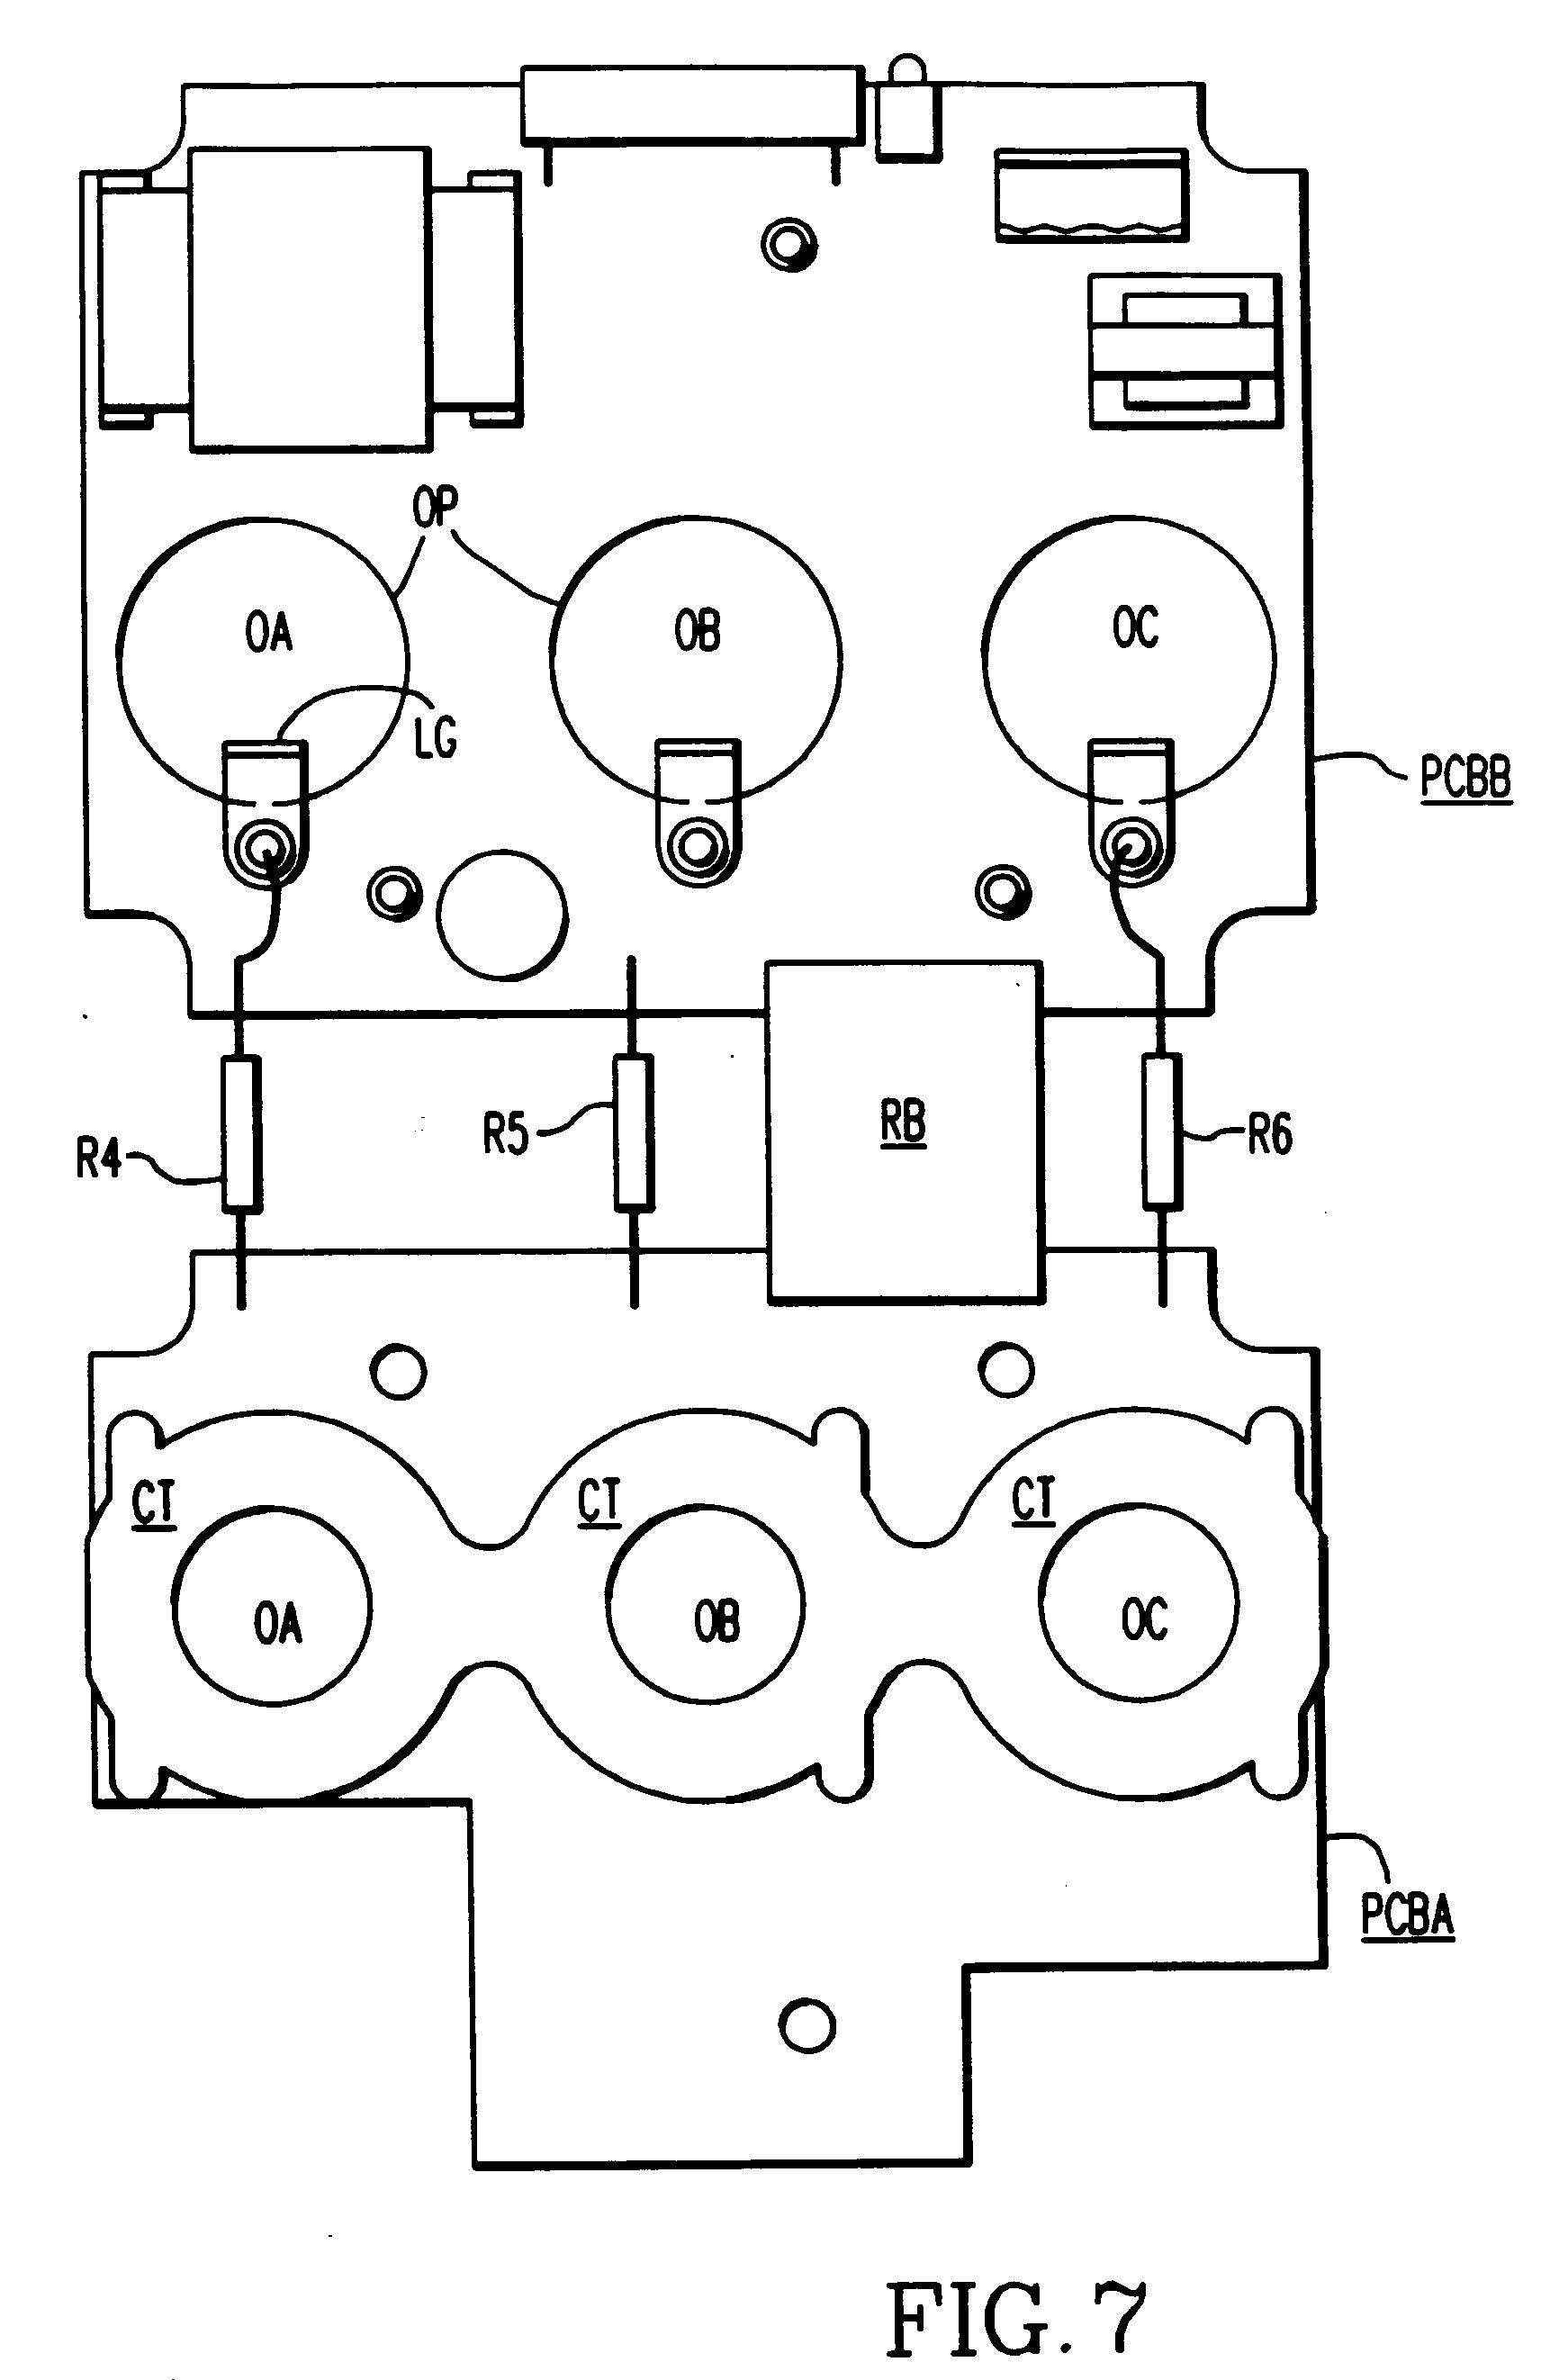 qo load center wiring diagram qo wiring diagram